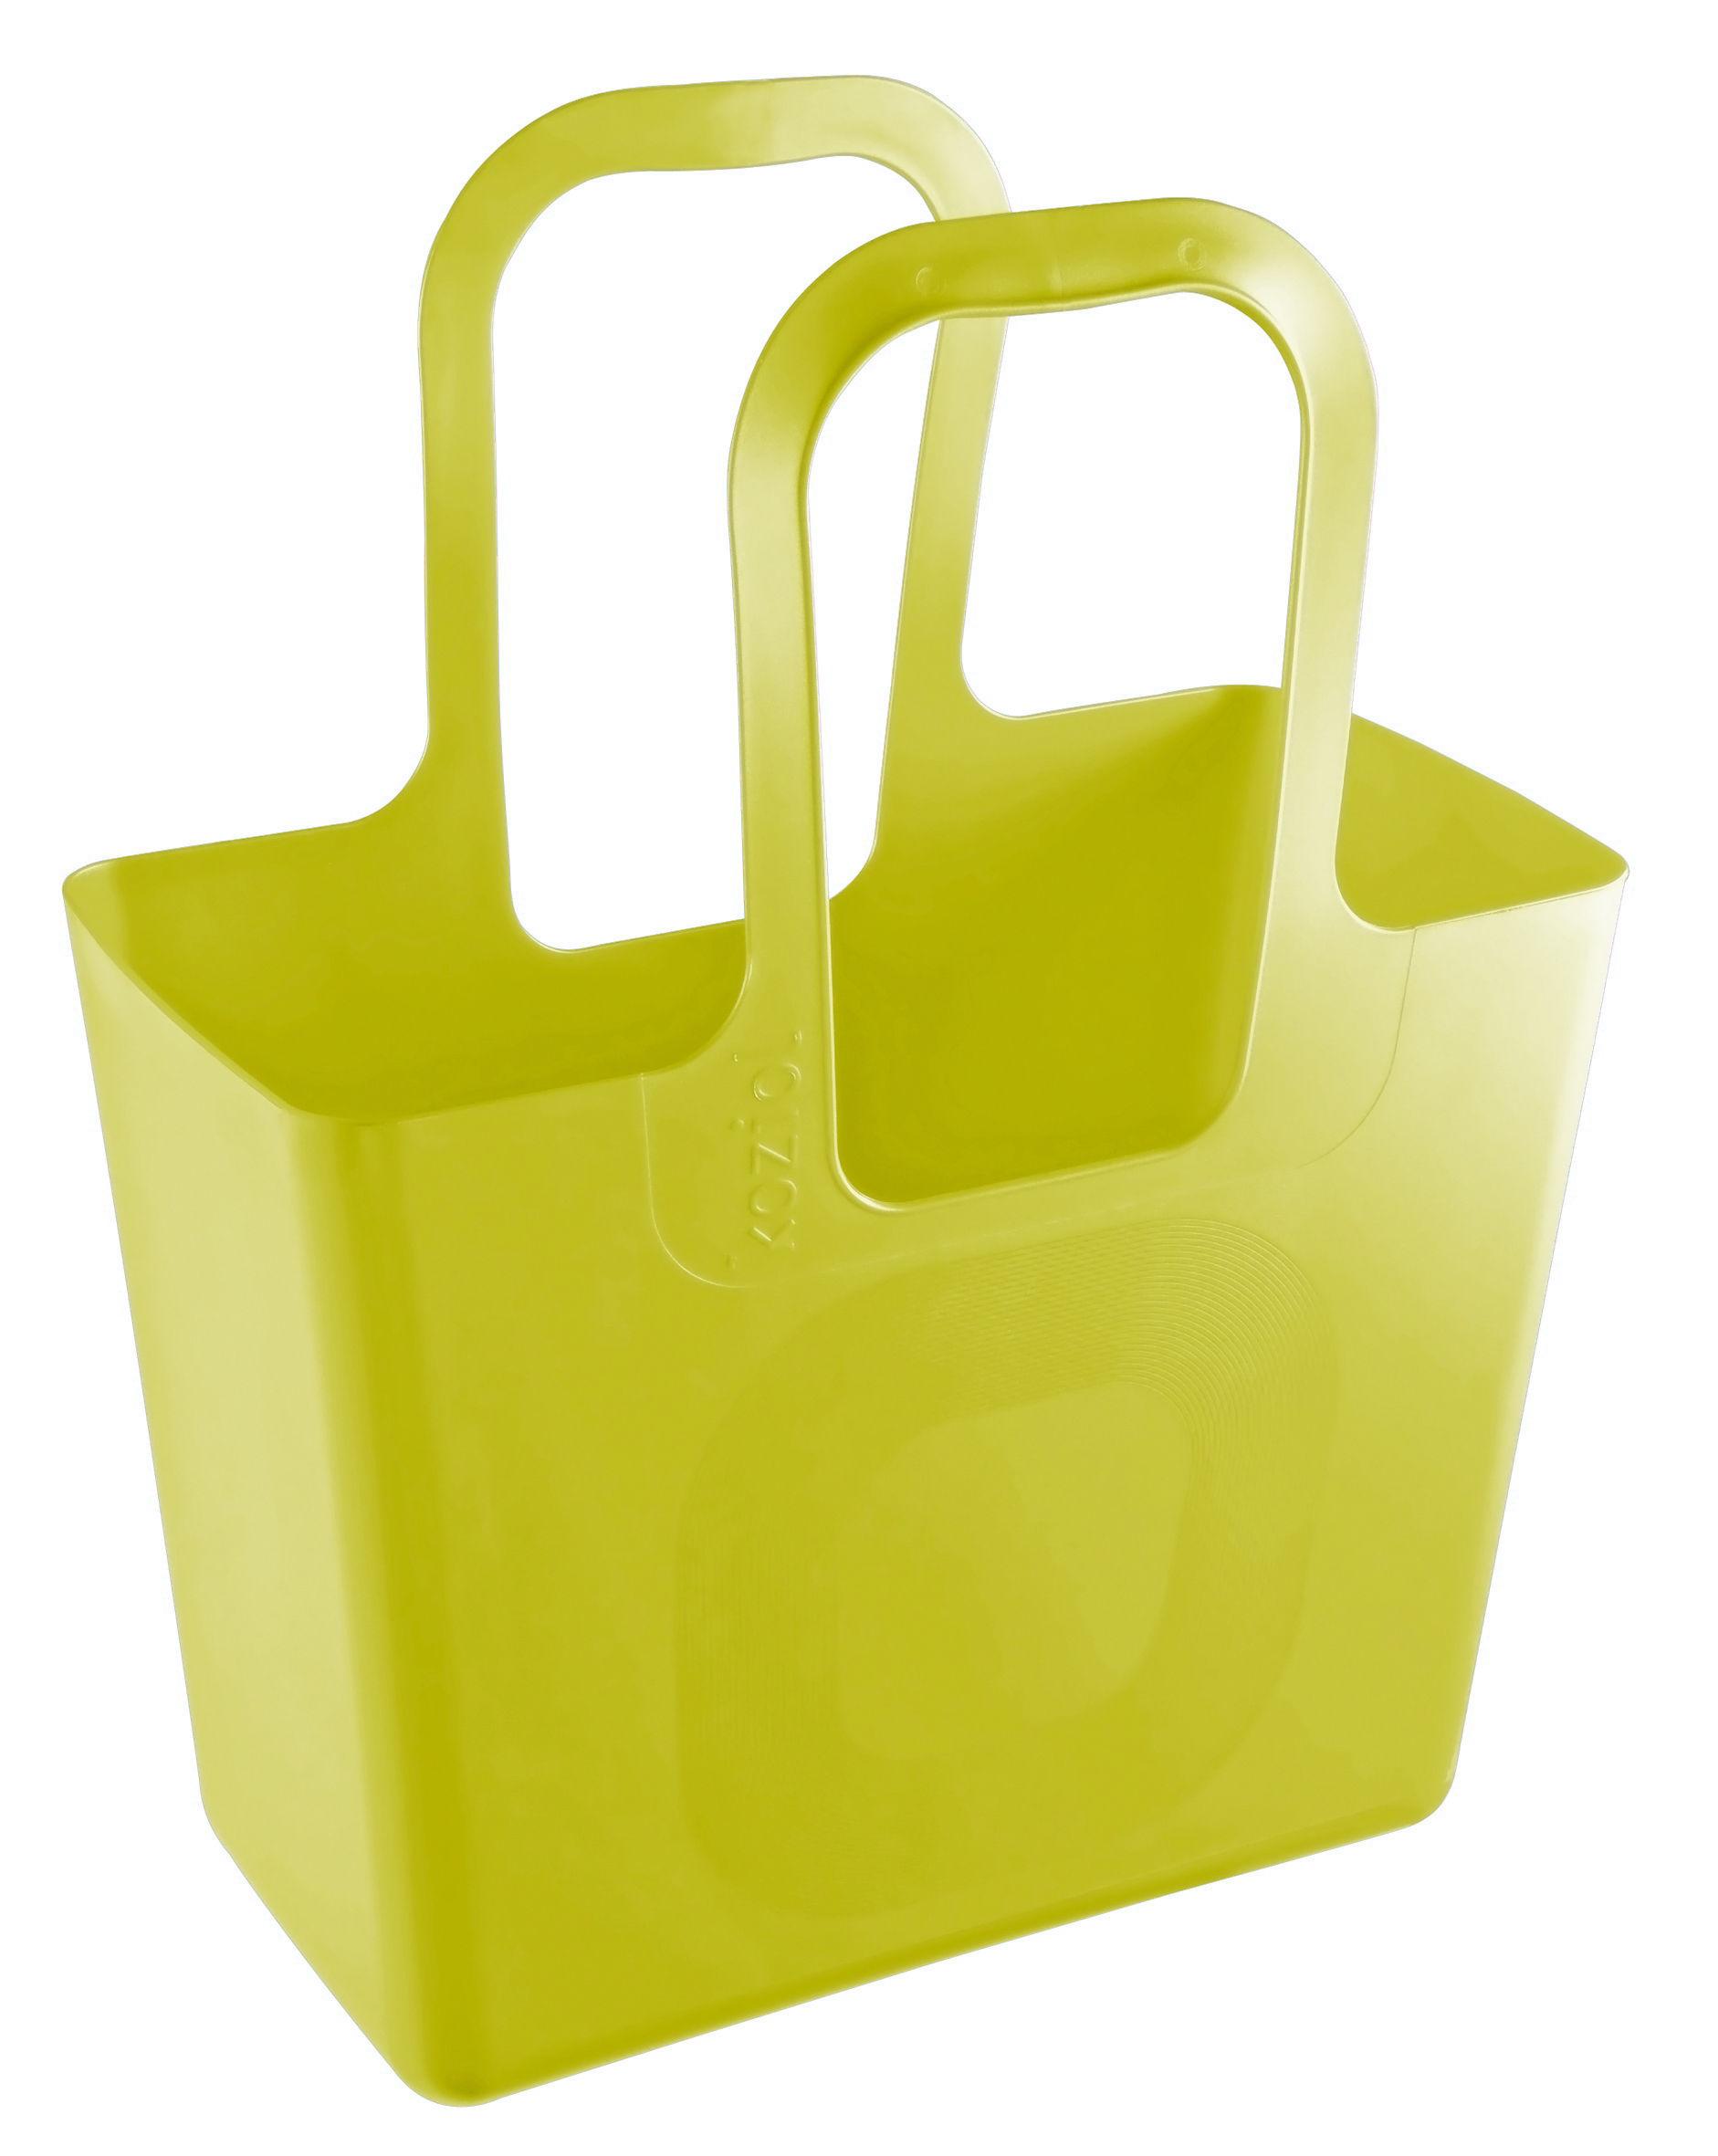 Decoration - For bathroom - Tasche XL Basket by Koziol - Mustard - Plastic material